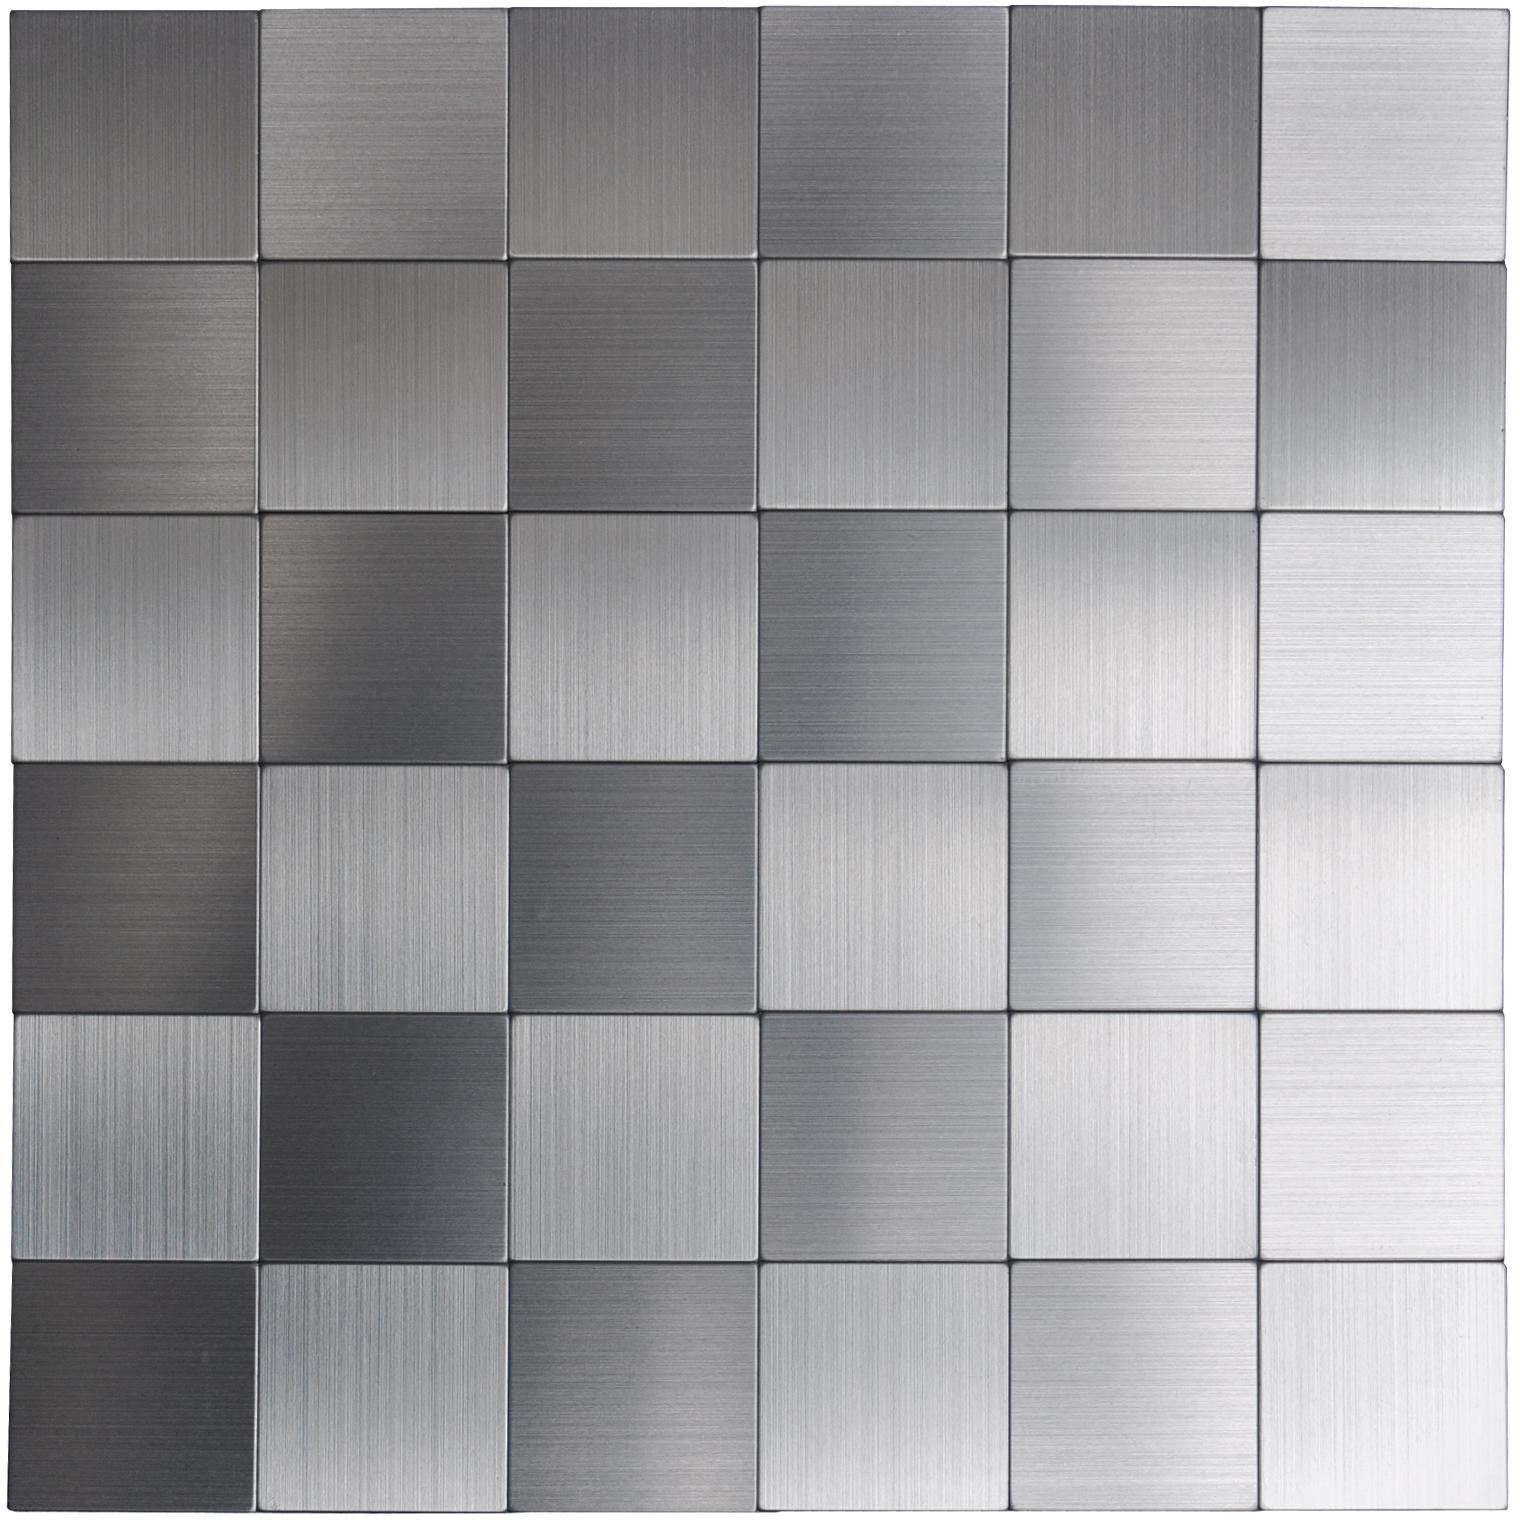 a16110 self adhesive metal tiles 10 pcs stainless peel n stick backsplashes tiles 12x12in